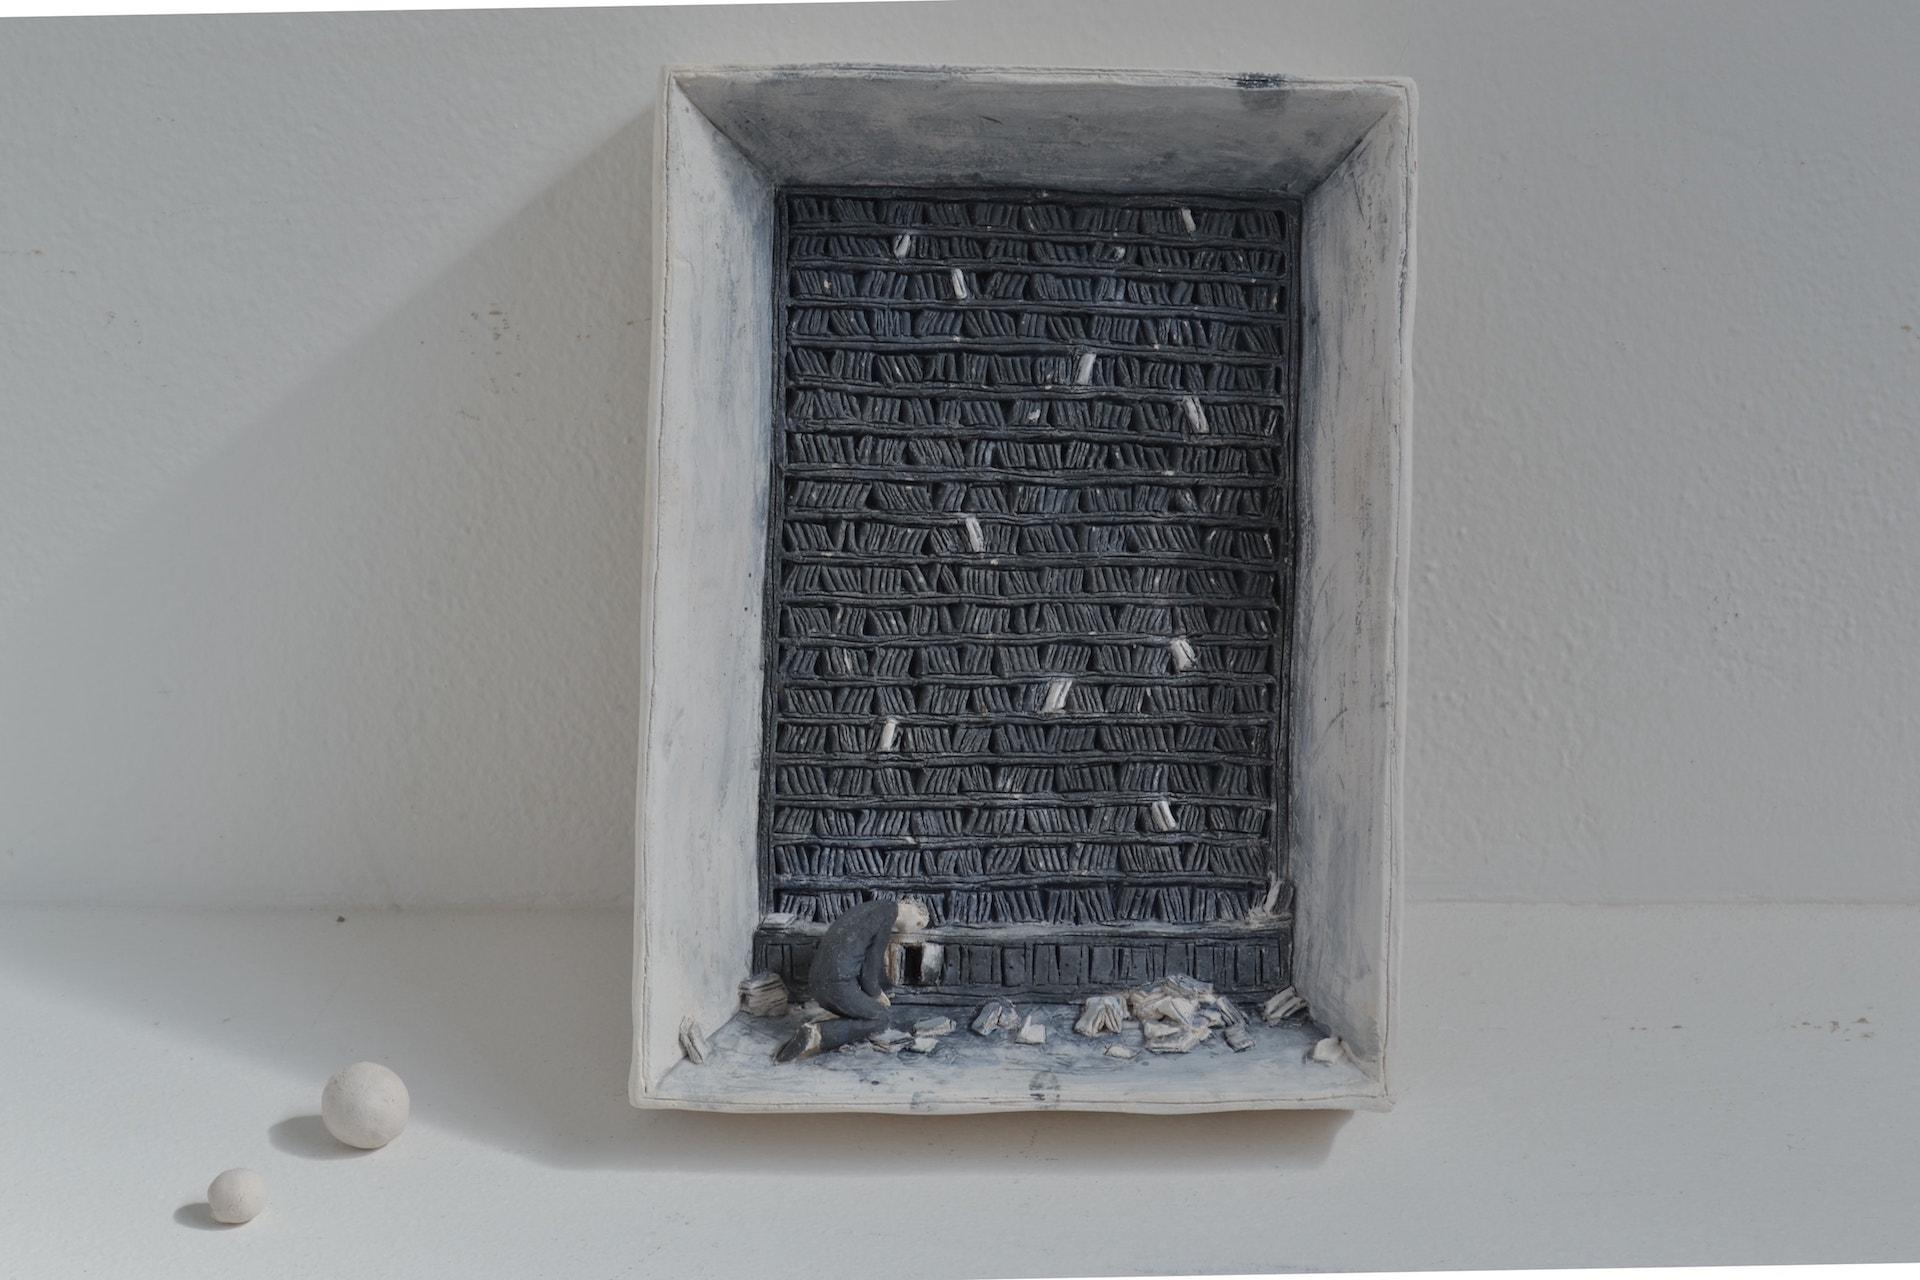 Inchiostro, 2018, terracotta a ingobbio, 5 x 20 x 27 cm